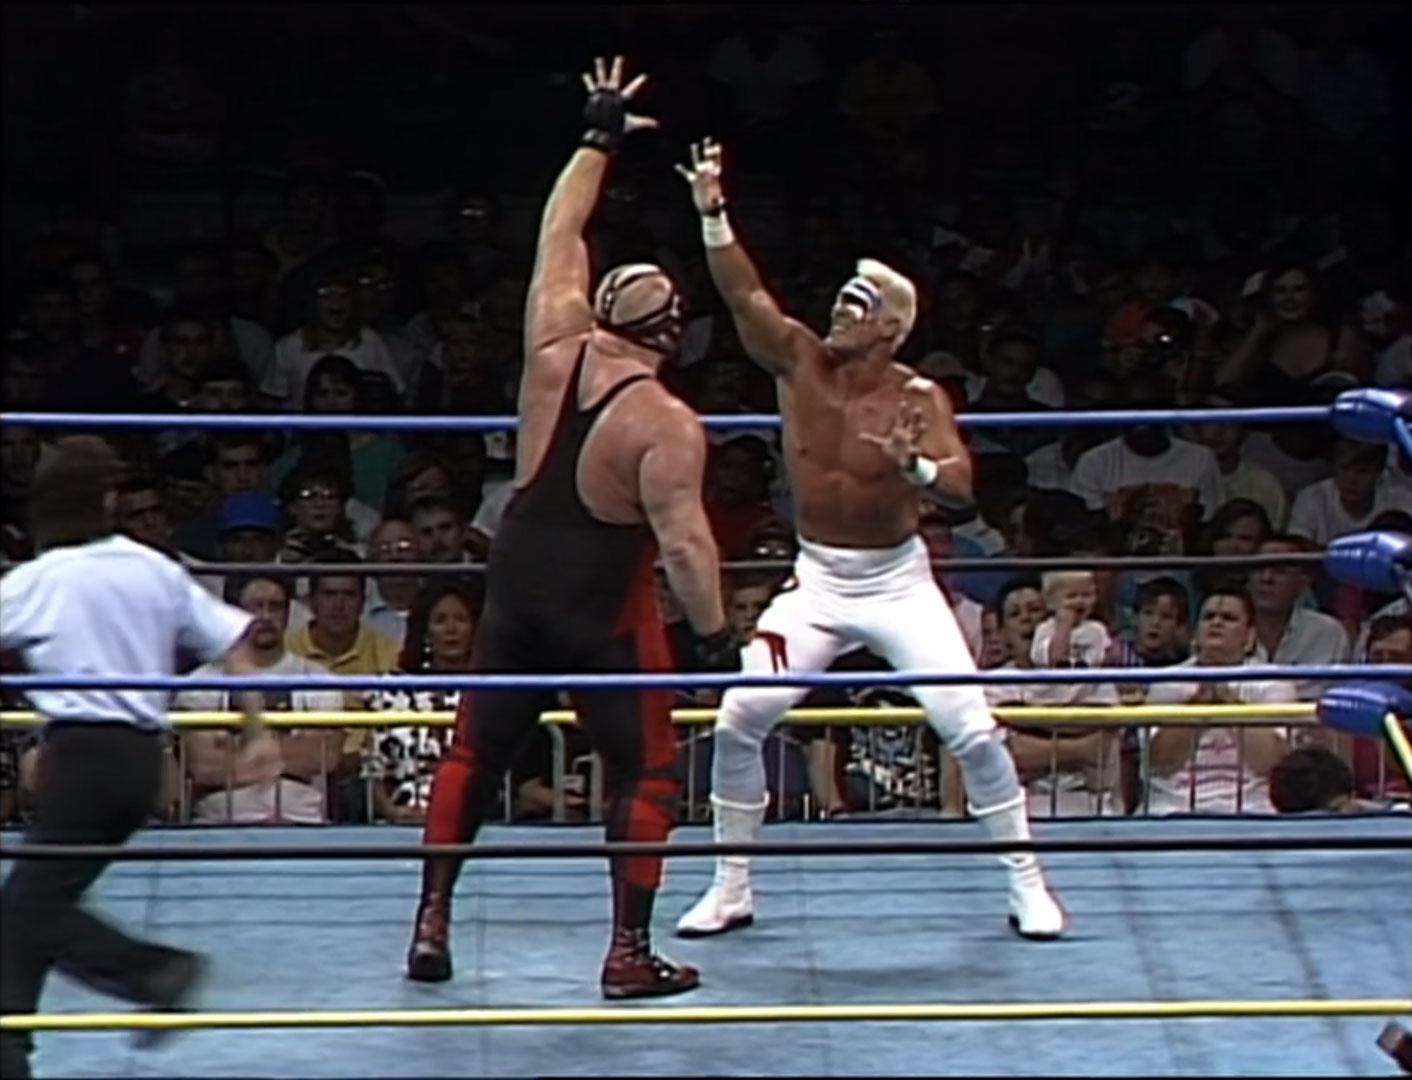 Sting vs. Big Van Vader WCW World Heavyweight Championship WCW Great American Bash '92, Jul 12th 1992